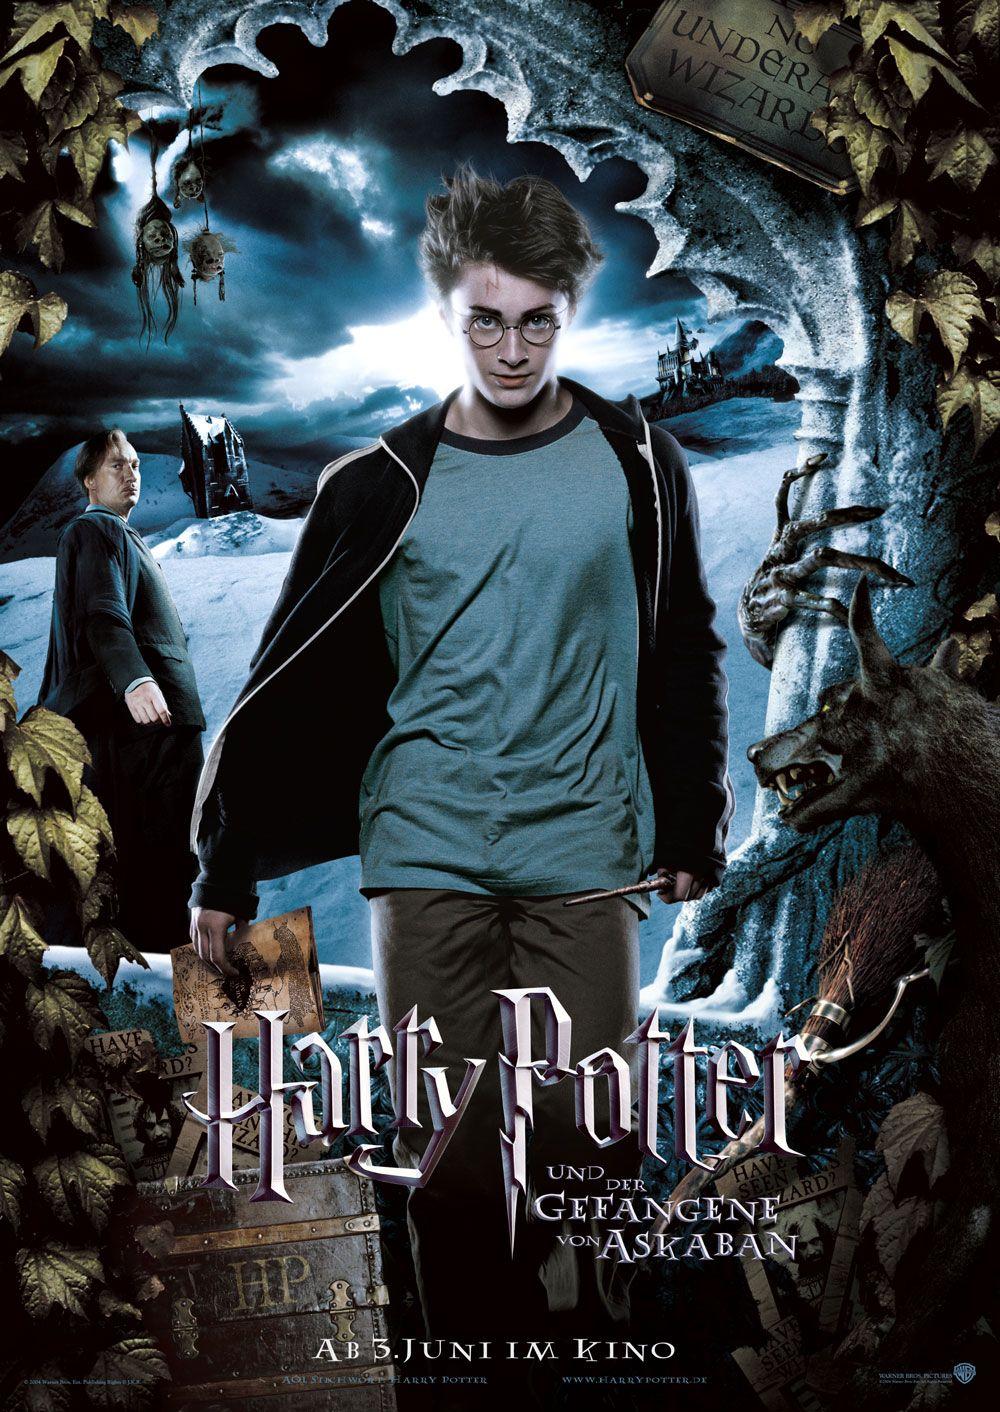 Pin By Warner Bros De On Harry Potter Harry Potter Tag Harry Potter Film Harry Potter Quiz